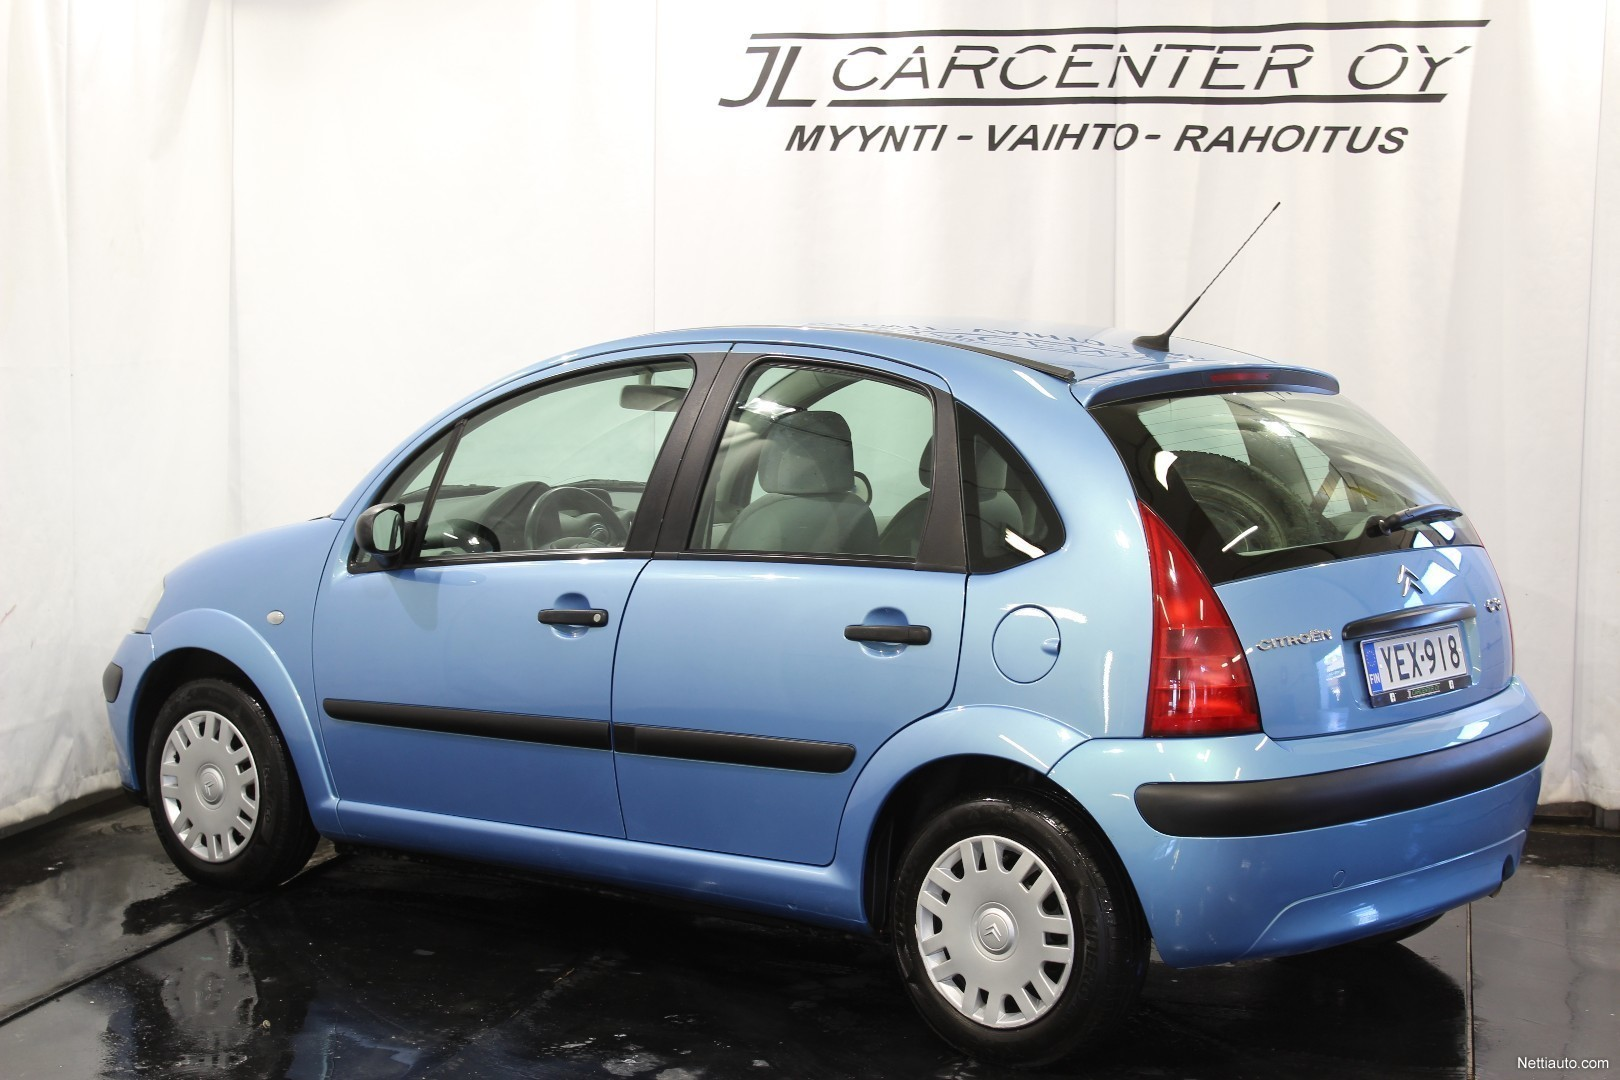 citroen c3 sx pack 5d ilmastoitu hatchback 2003 used vehicle nettiauto. Black Bedroom Furniture Sets. Home Design Ideas